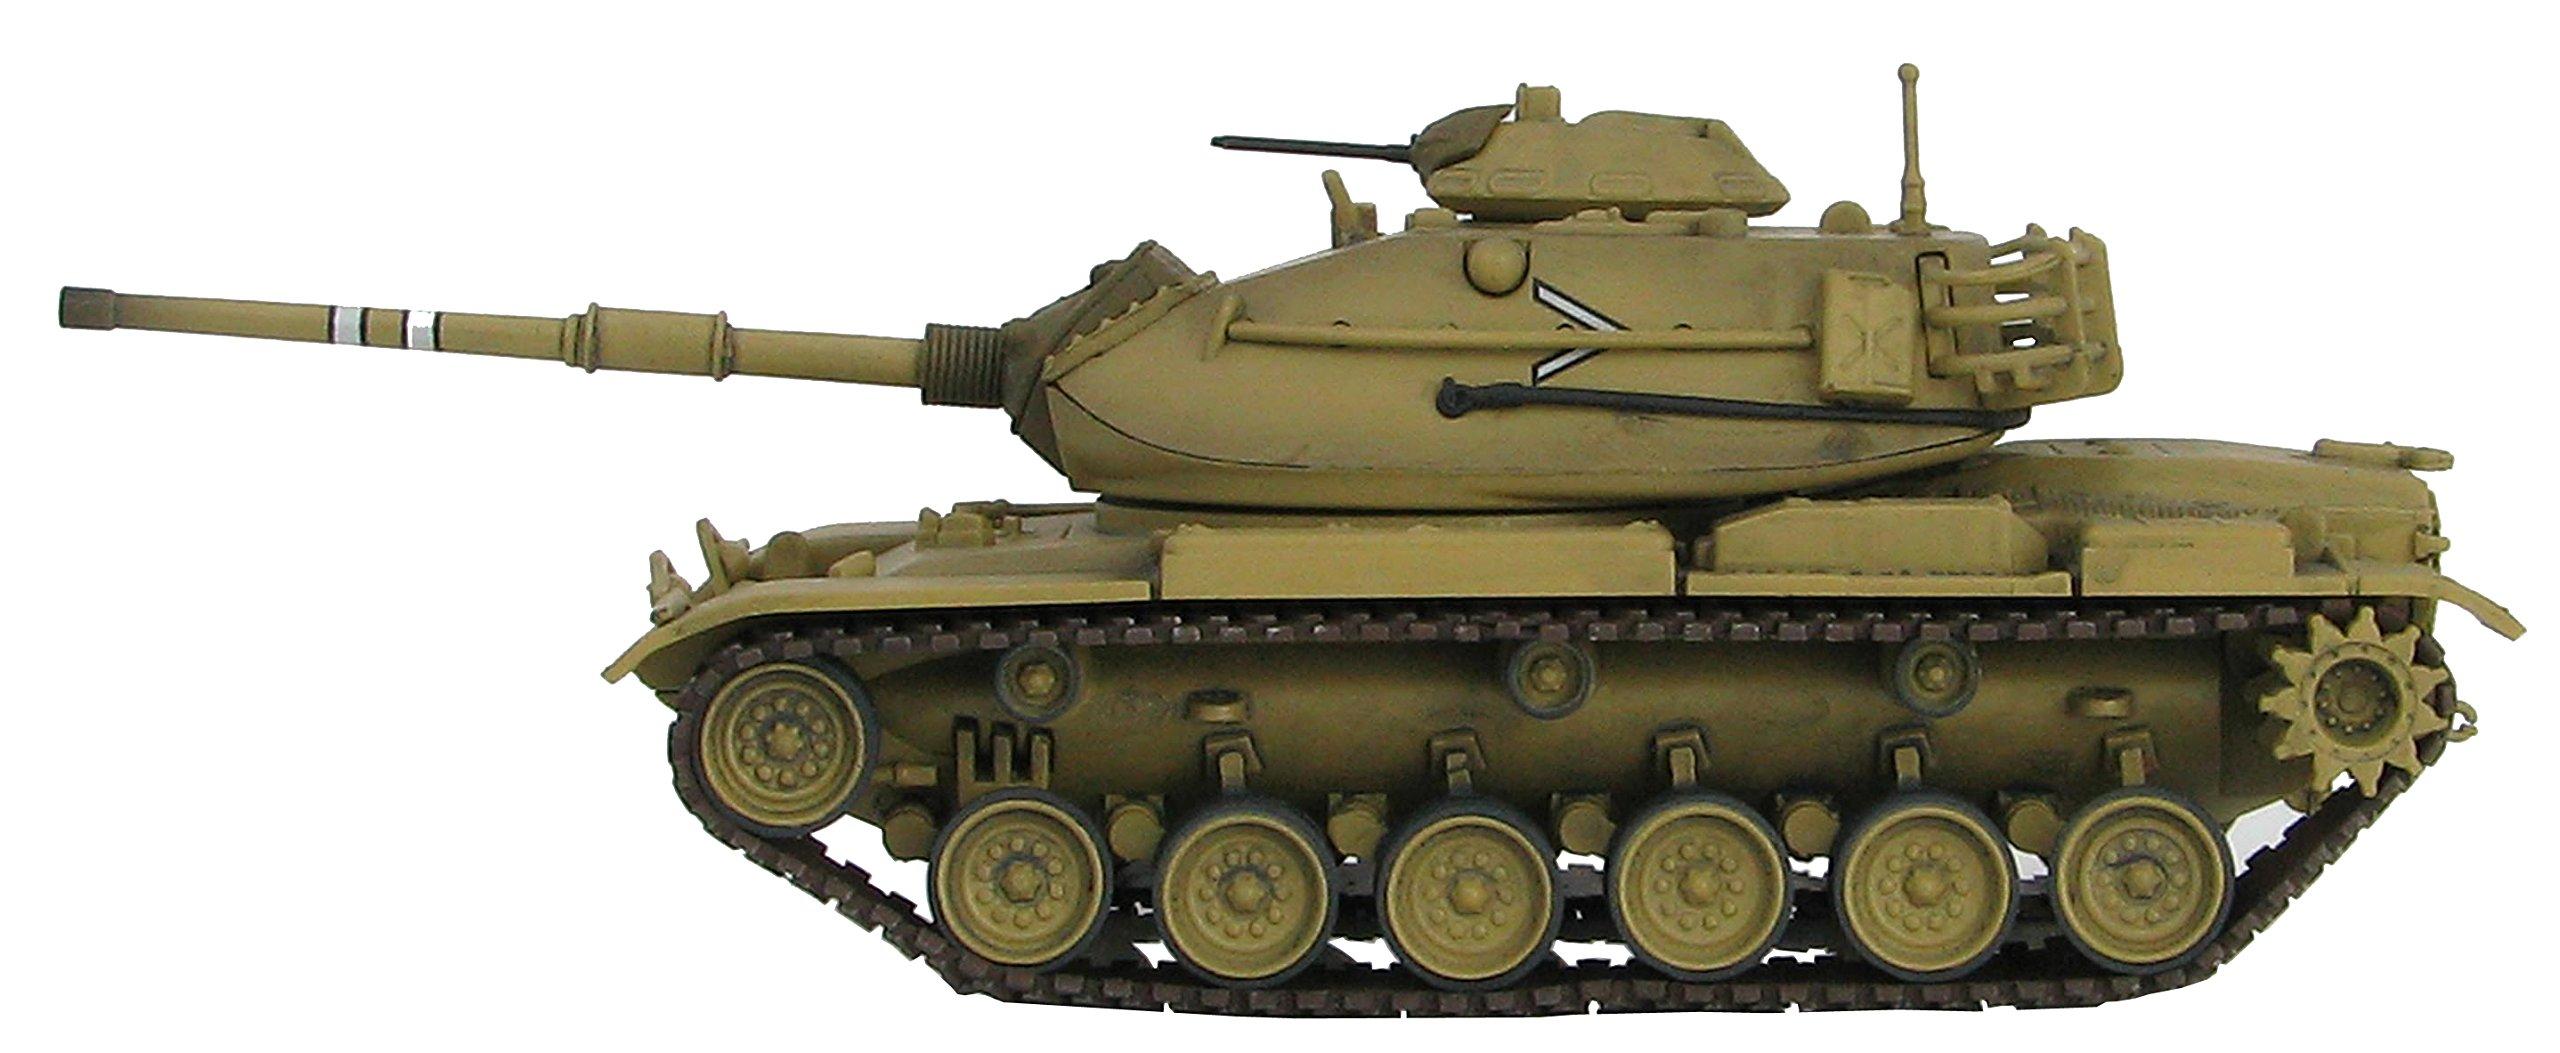 Hobby Master 5602 M60A1 Patton Tank IDF Sinai Oct 1973 1/72 Scale Model